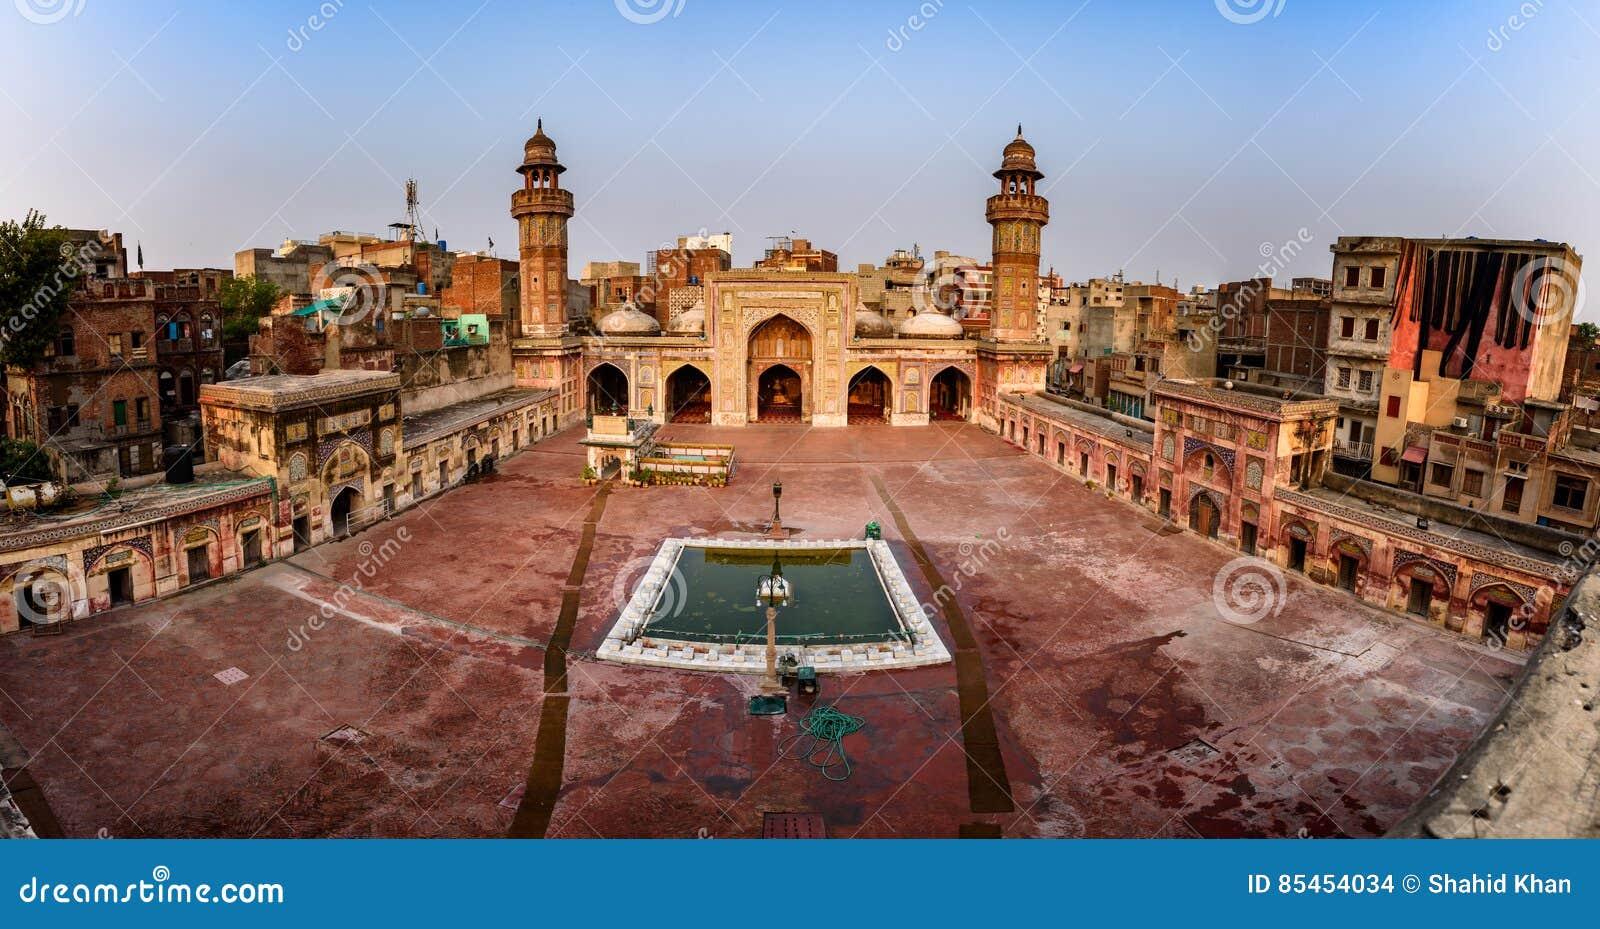 Masjid Wazir Khan Lahore Pakistan